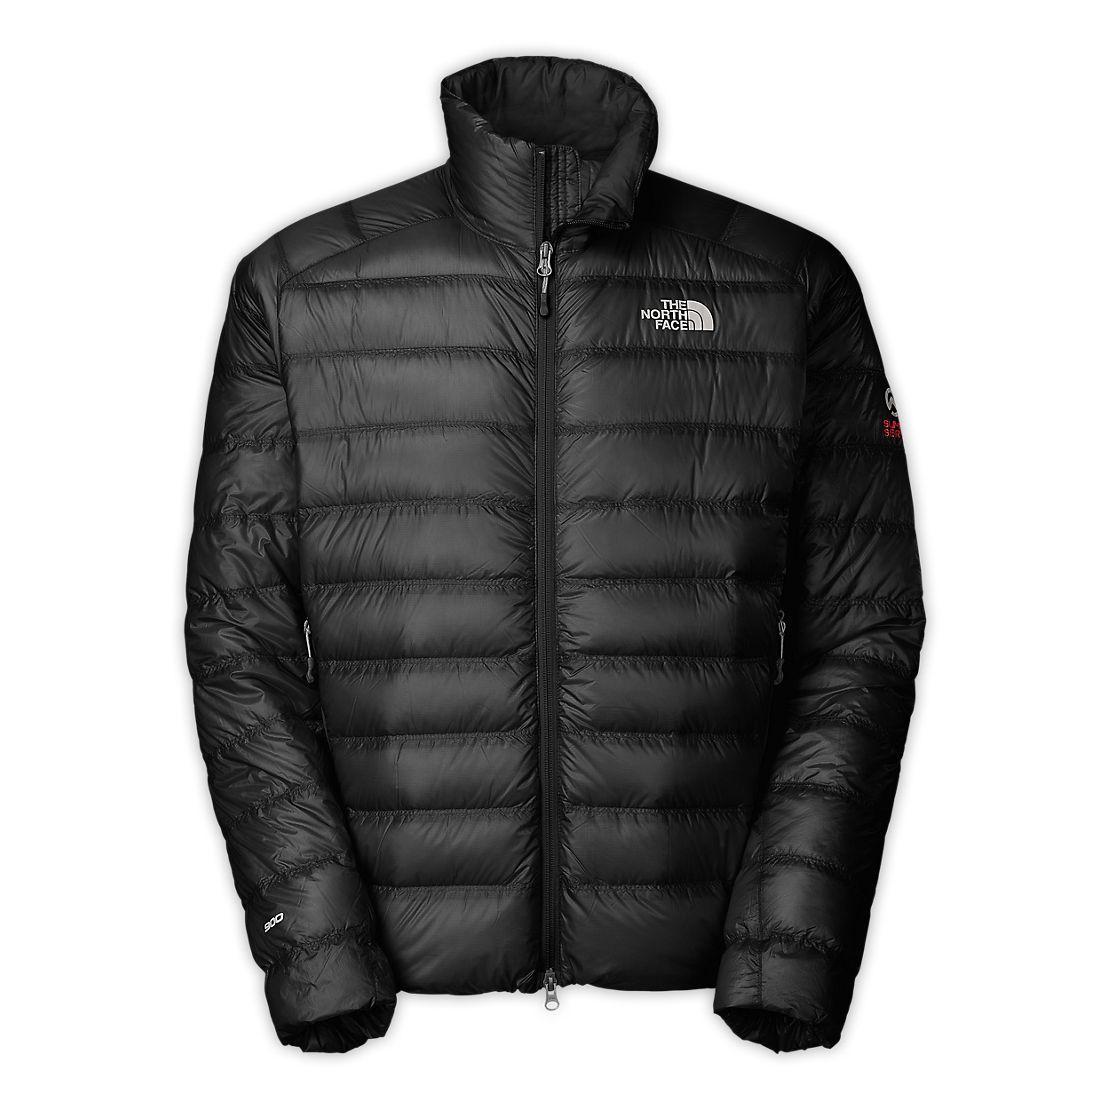 The North Face Super Diez Jacket N North Face Mens Mens Vest Jacket Jackets [ 1110 x 1110 Pixel ]